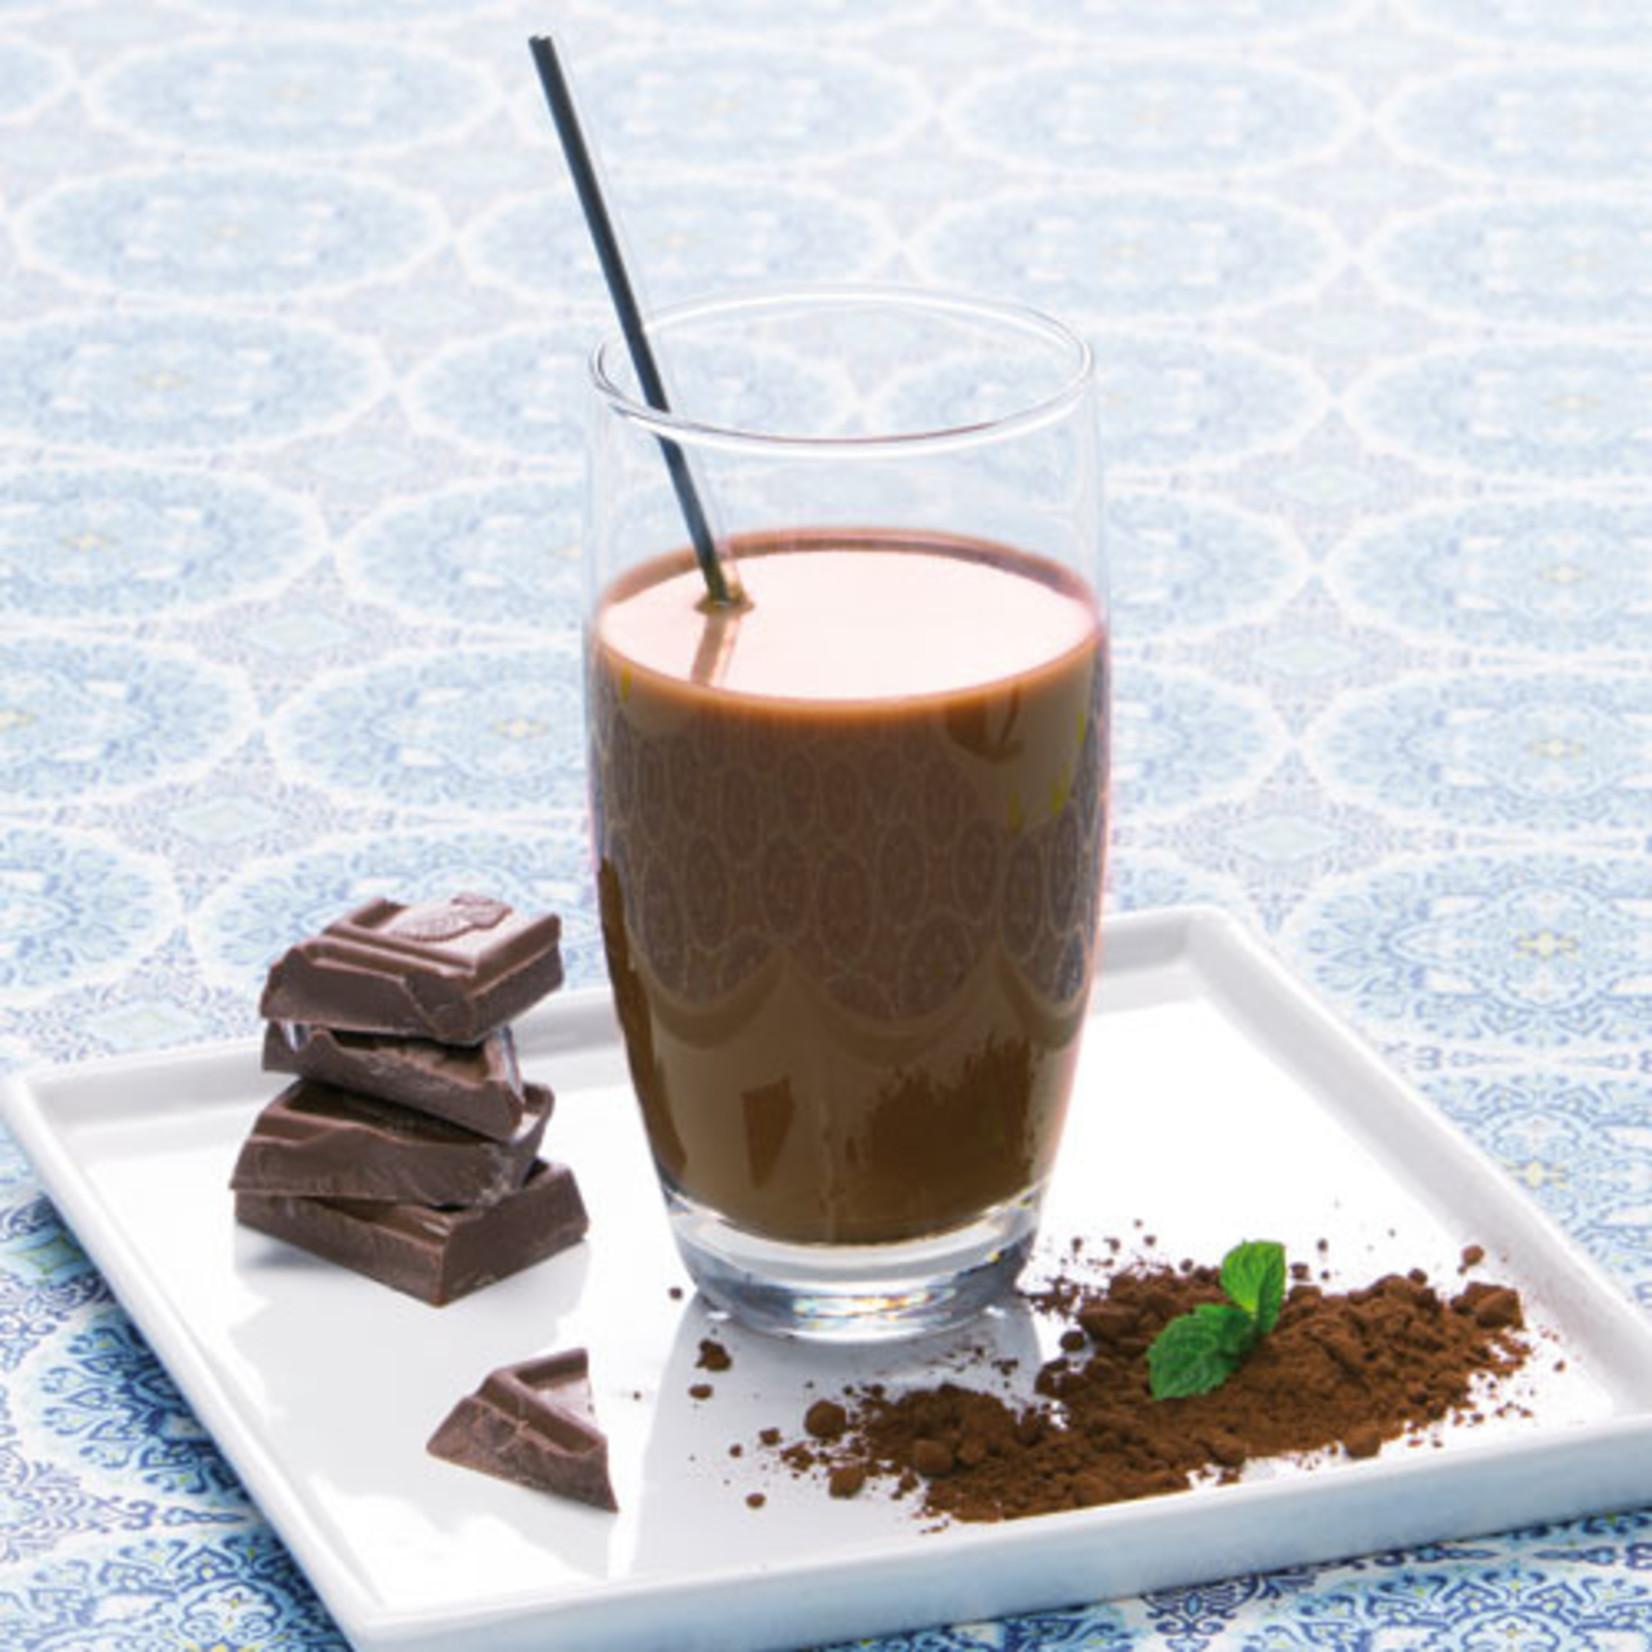 Powerslim PSPS03053 Chocolade drank ready to go